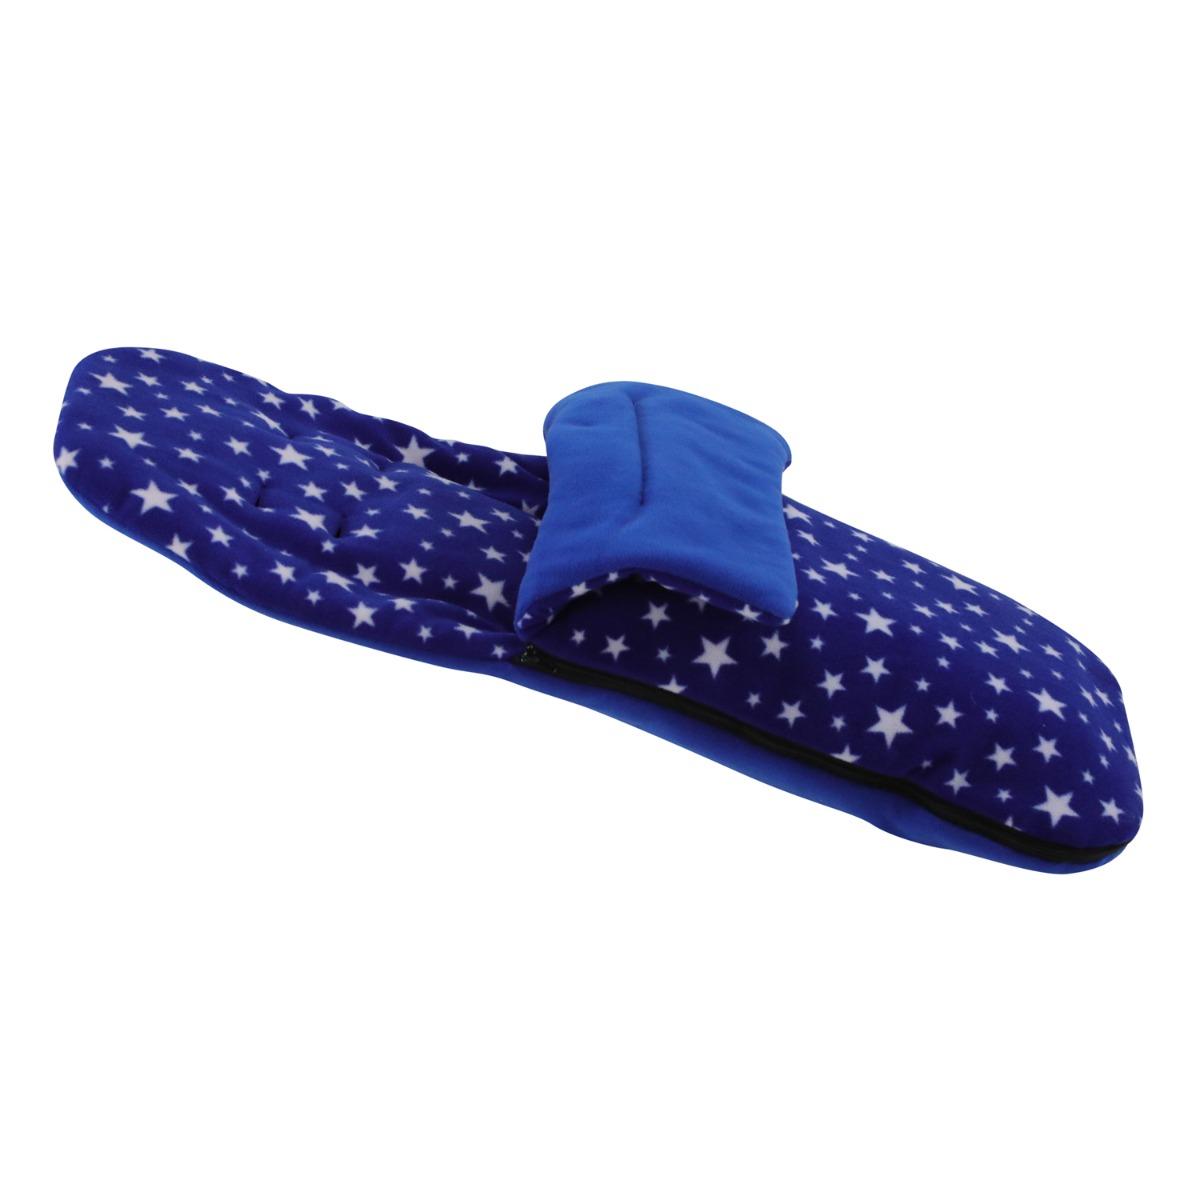 Saco De Lana//acogedor Toes compatible con Phil /& Teds